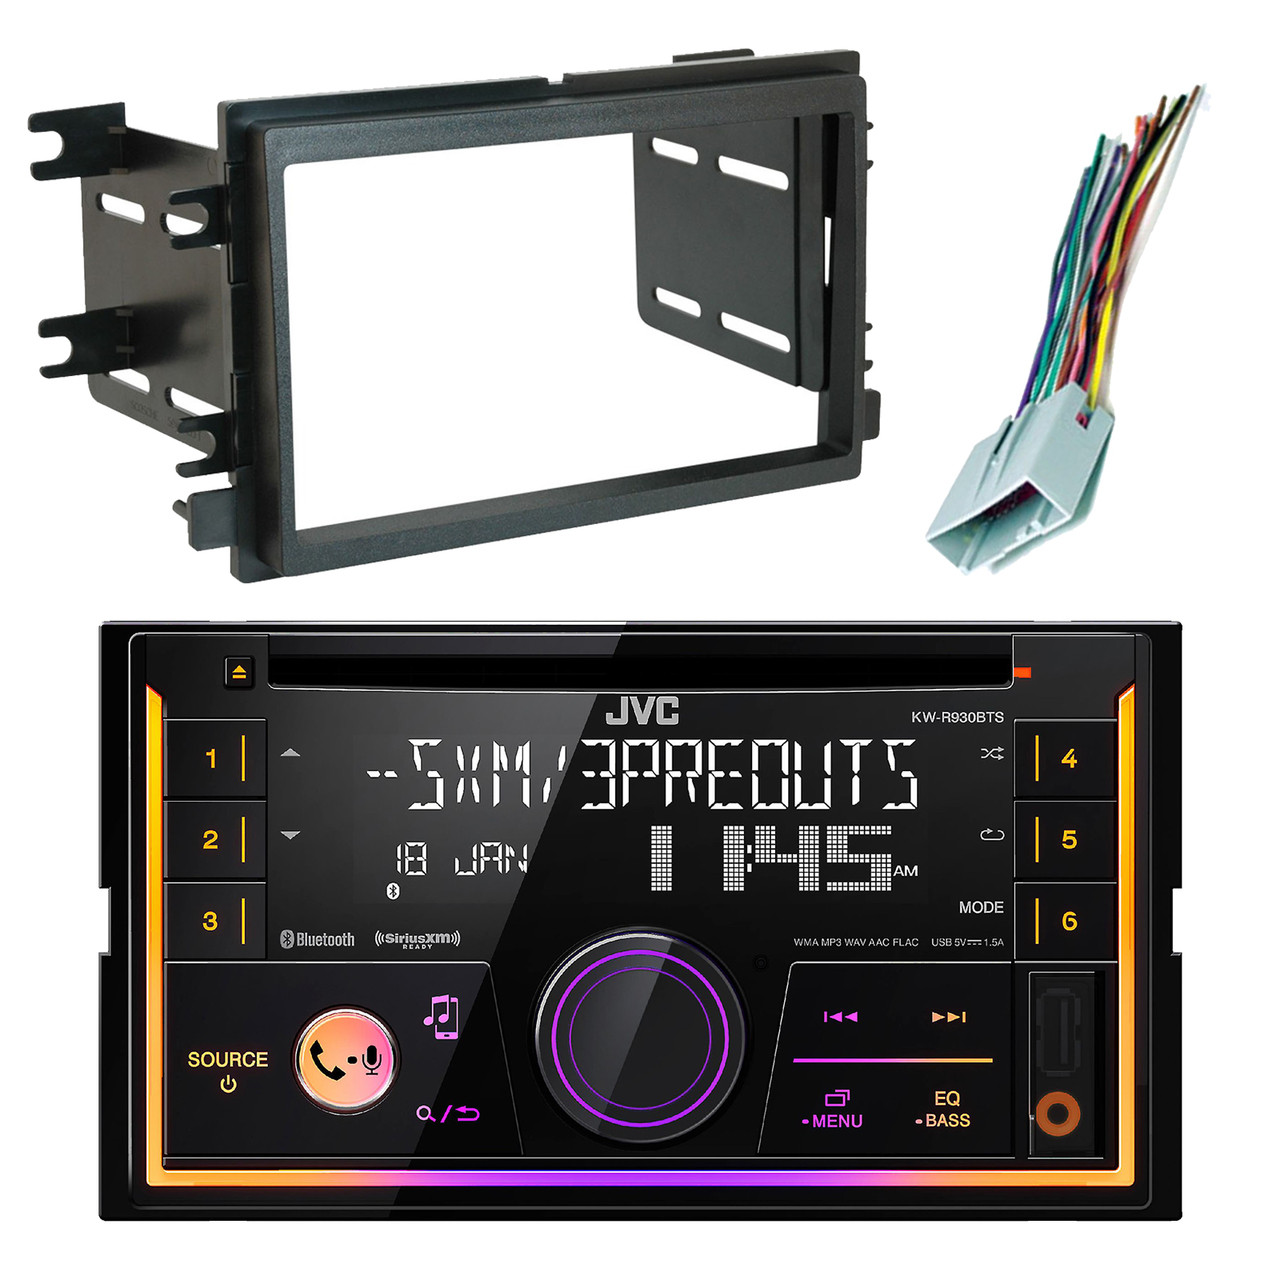 JVC KWR930BTS 2-DIN USB CD Bluetooth Radio, Scosche Dash Kit, Radio on